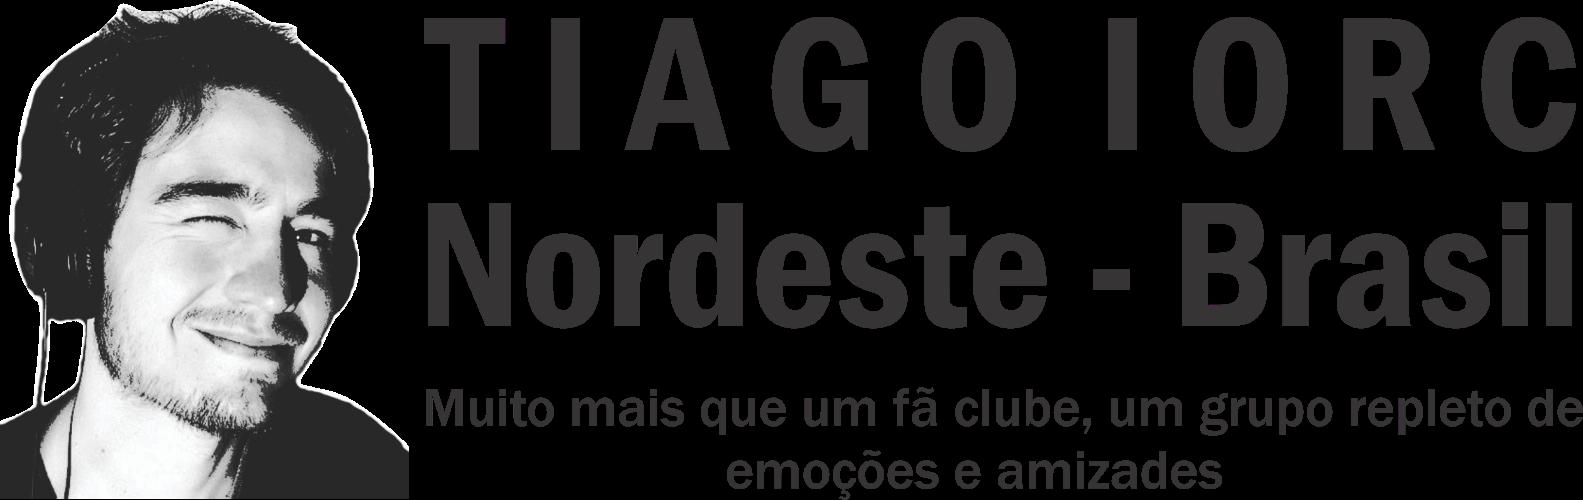 FC Tiago Iorc Nordeste Brasil